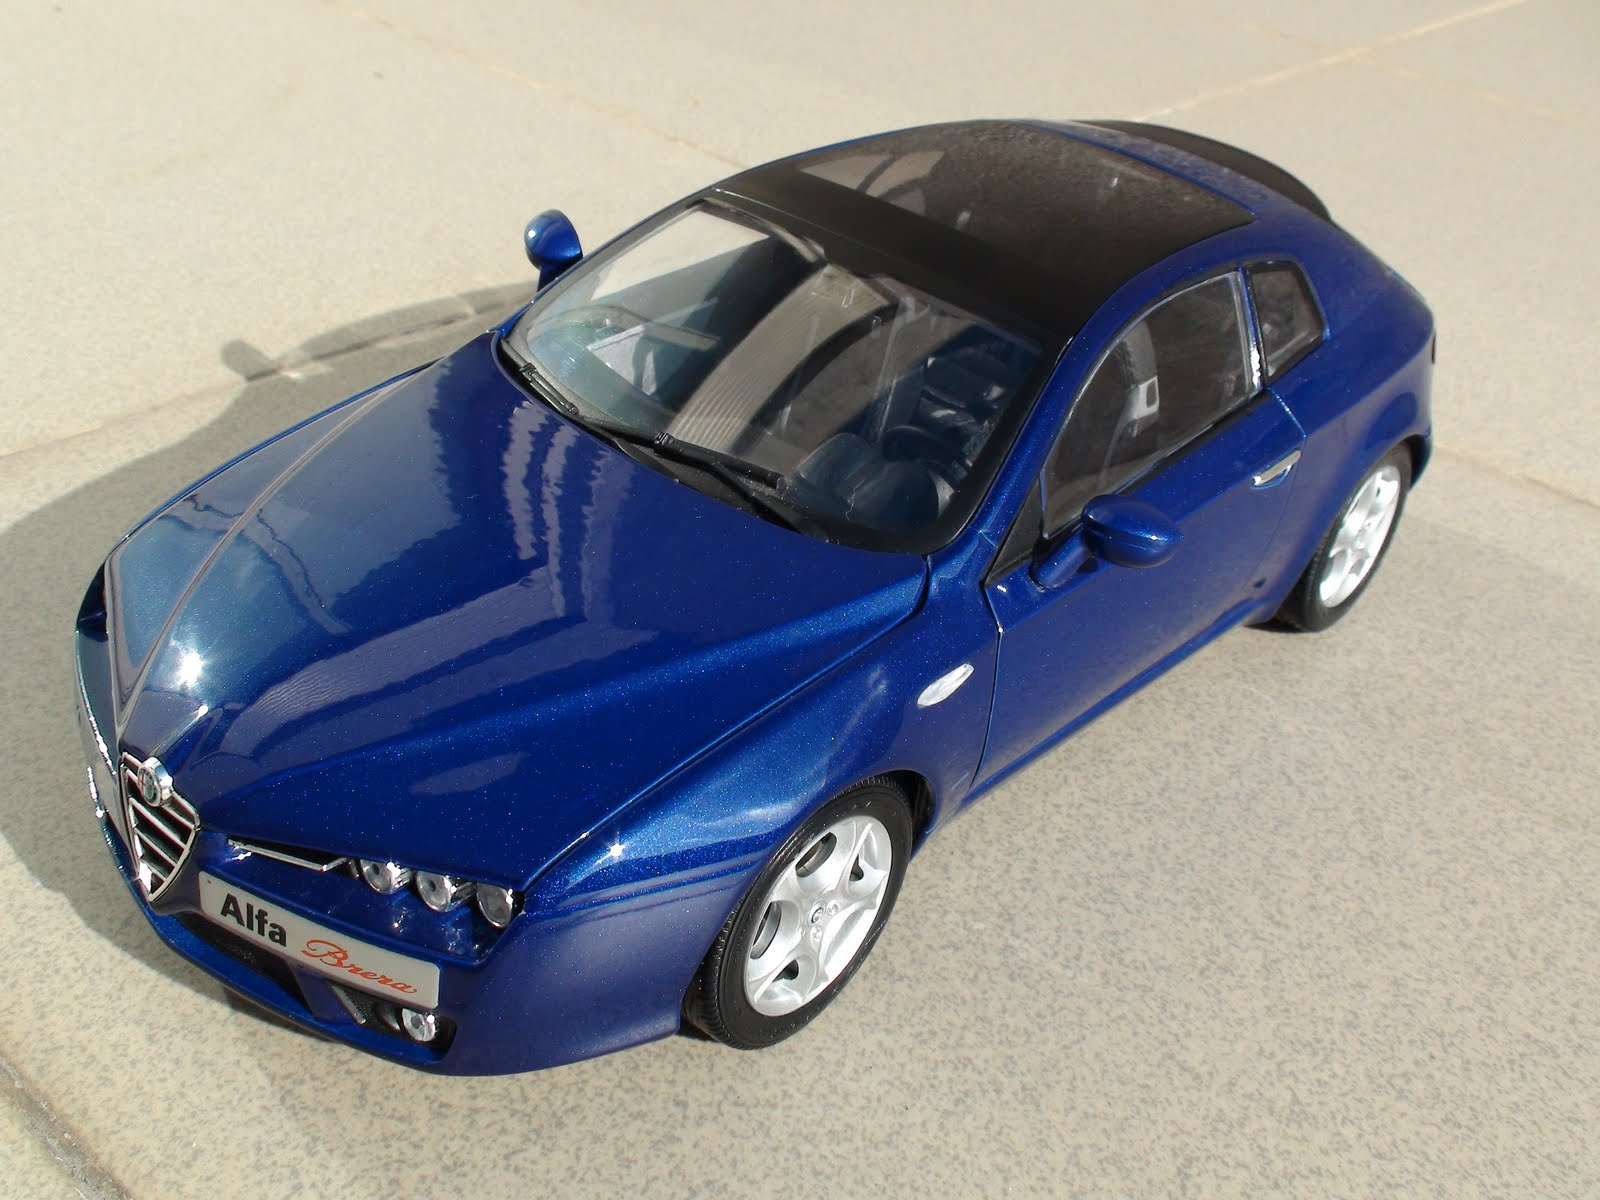 Pseudo Cars: Alfa Romeo Brera